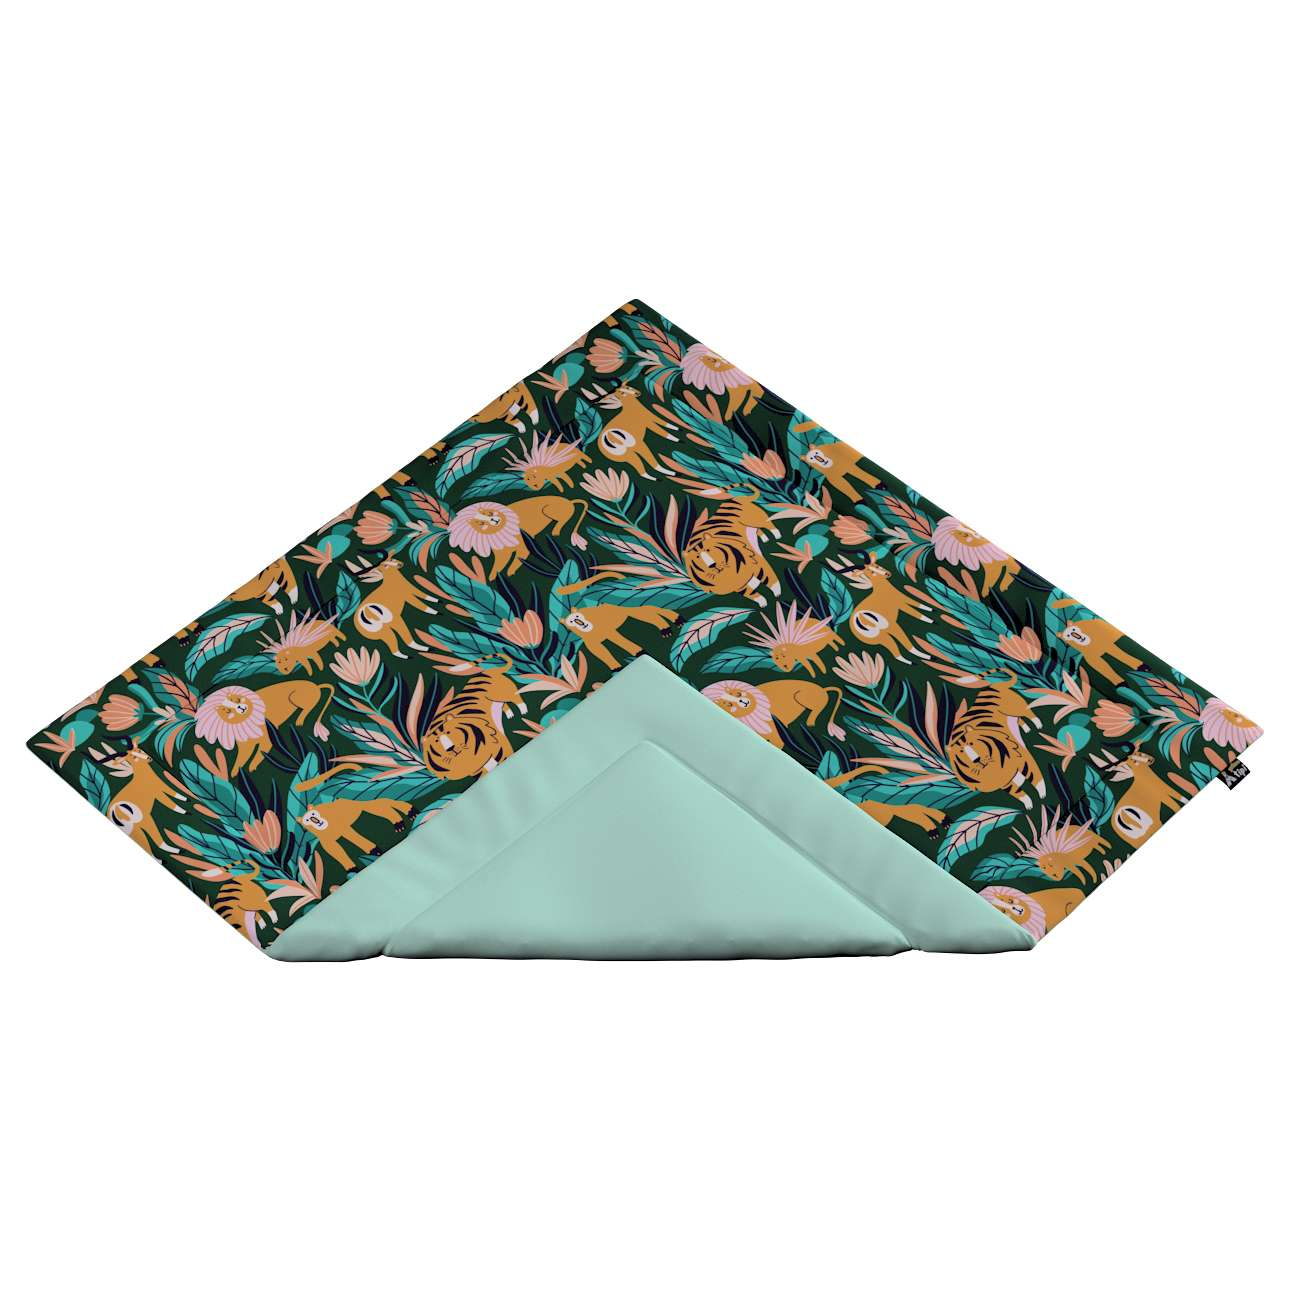 Tepee kilimėlis kolekcijoje Magic Collection, audinys: 500-42